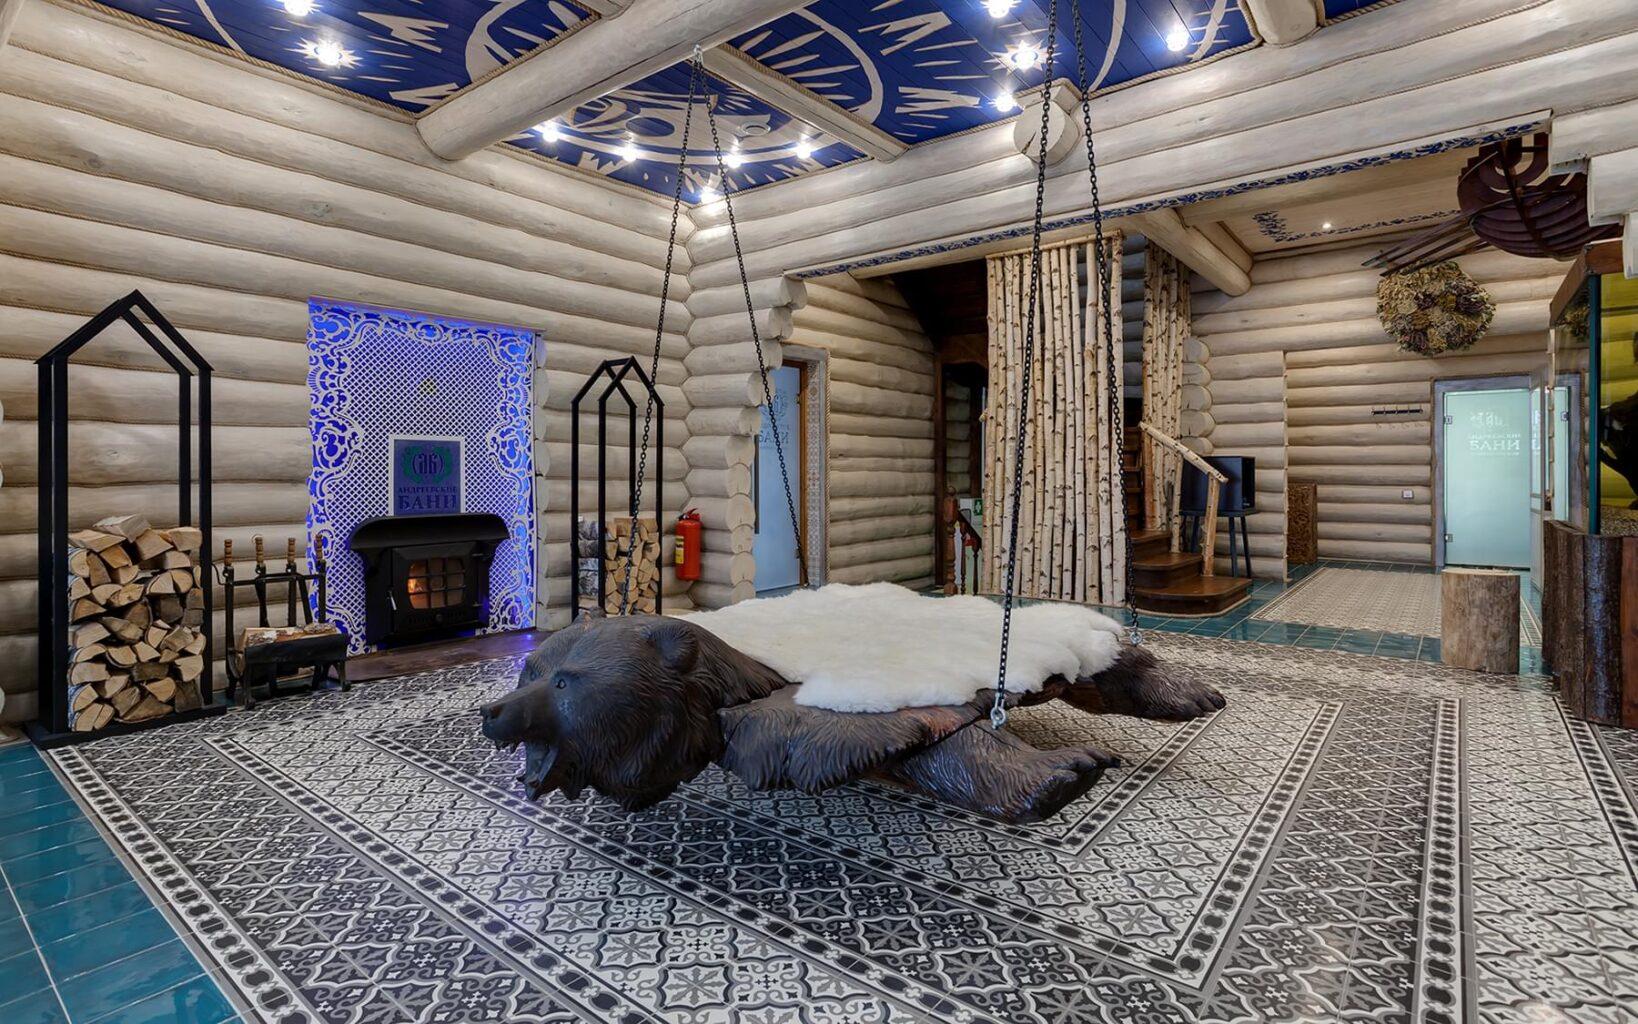 Качели в виде медведя в СПА-клубе Андреевские бани